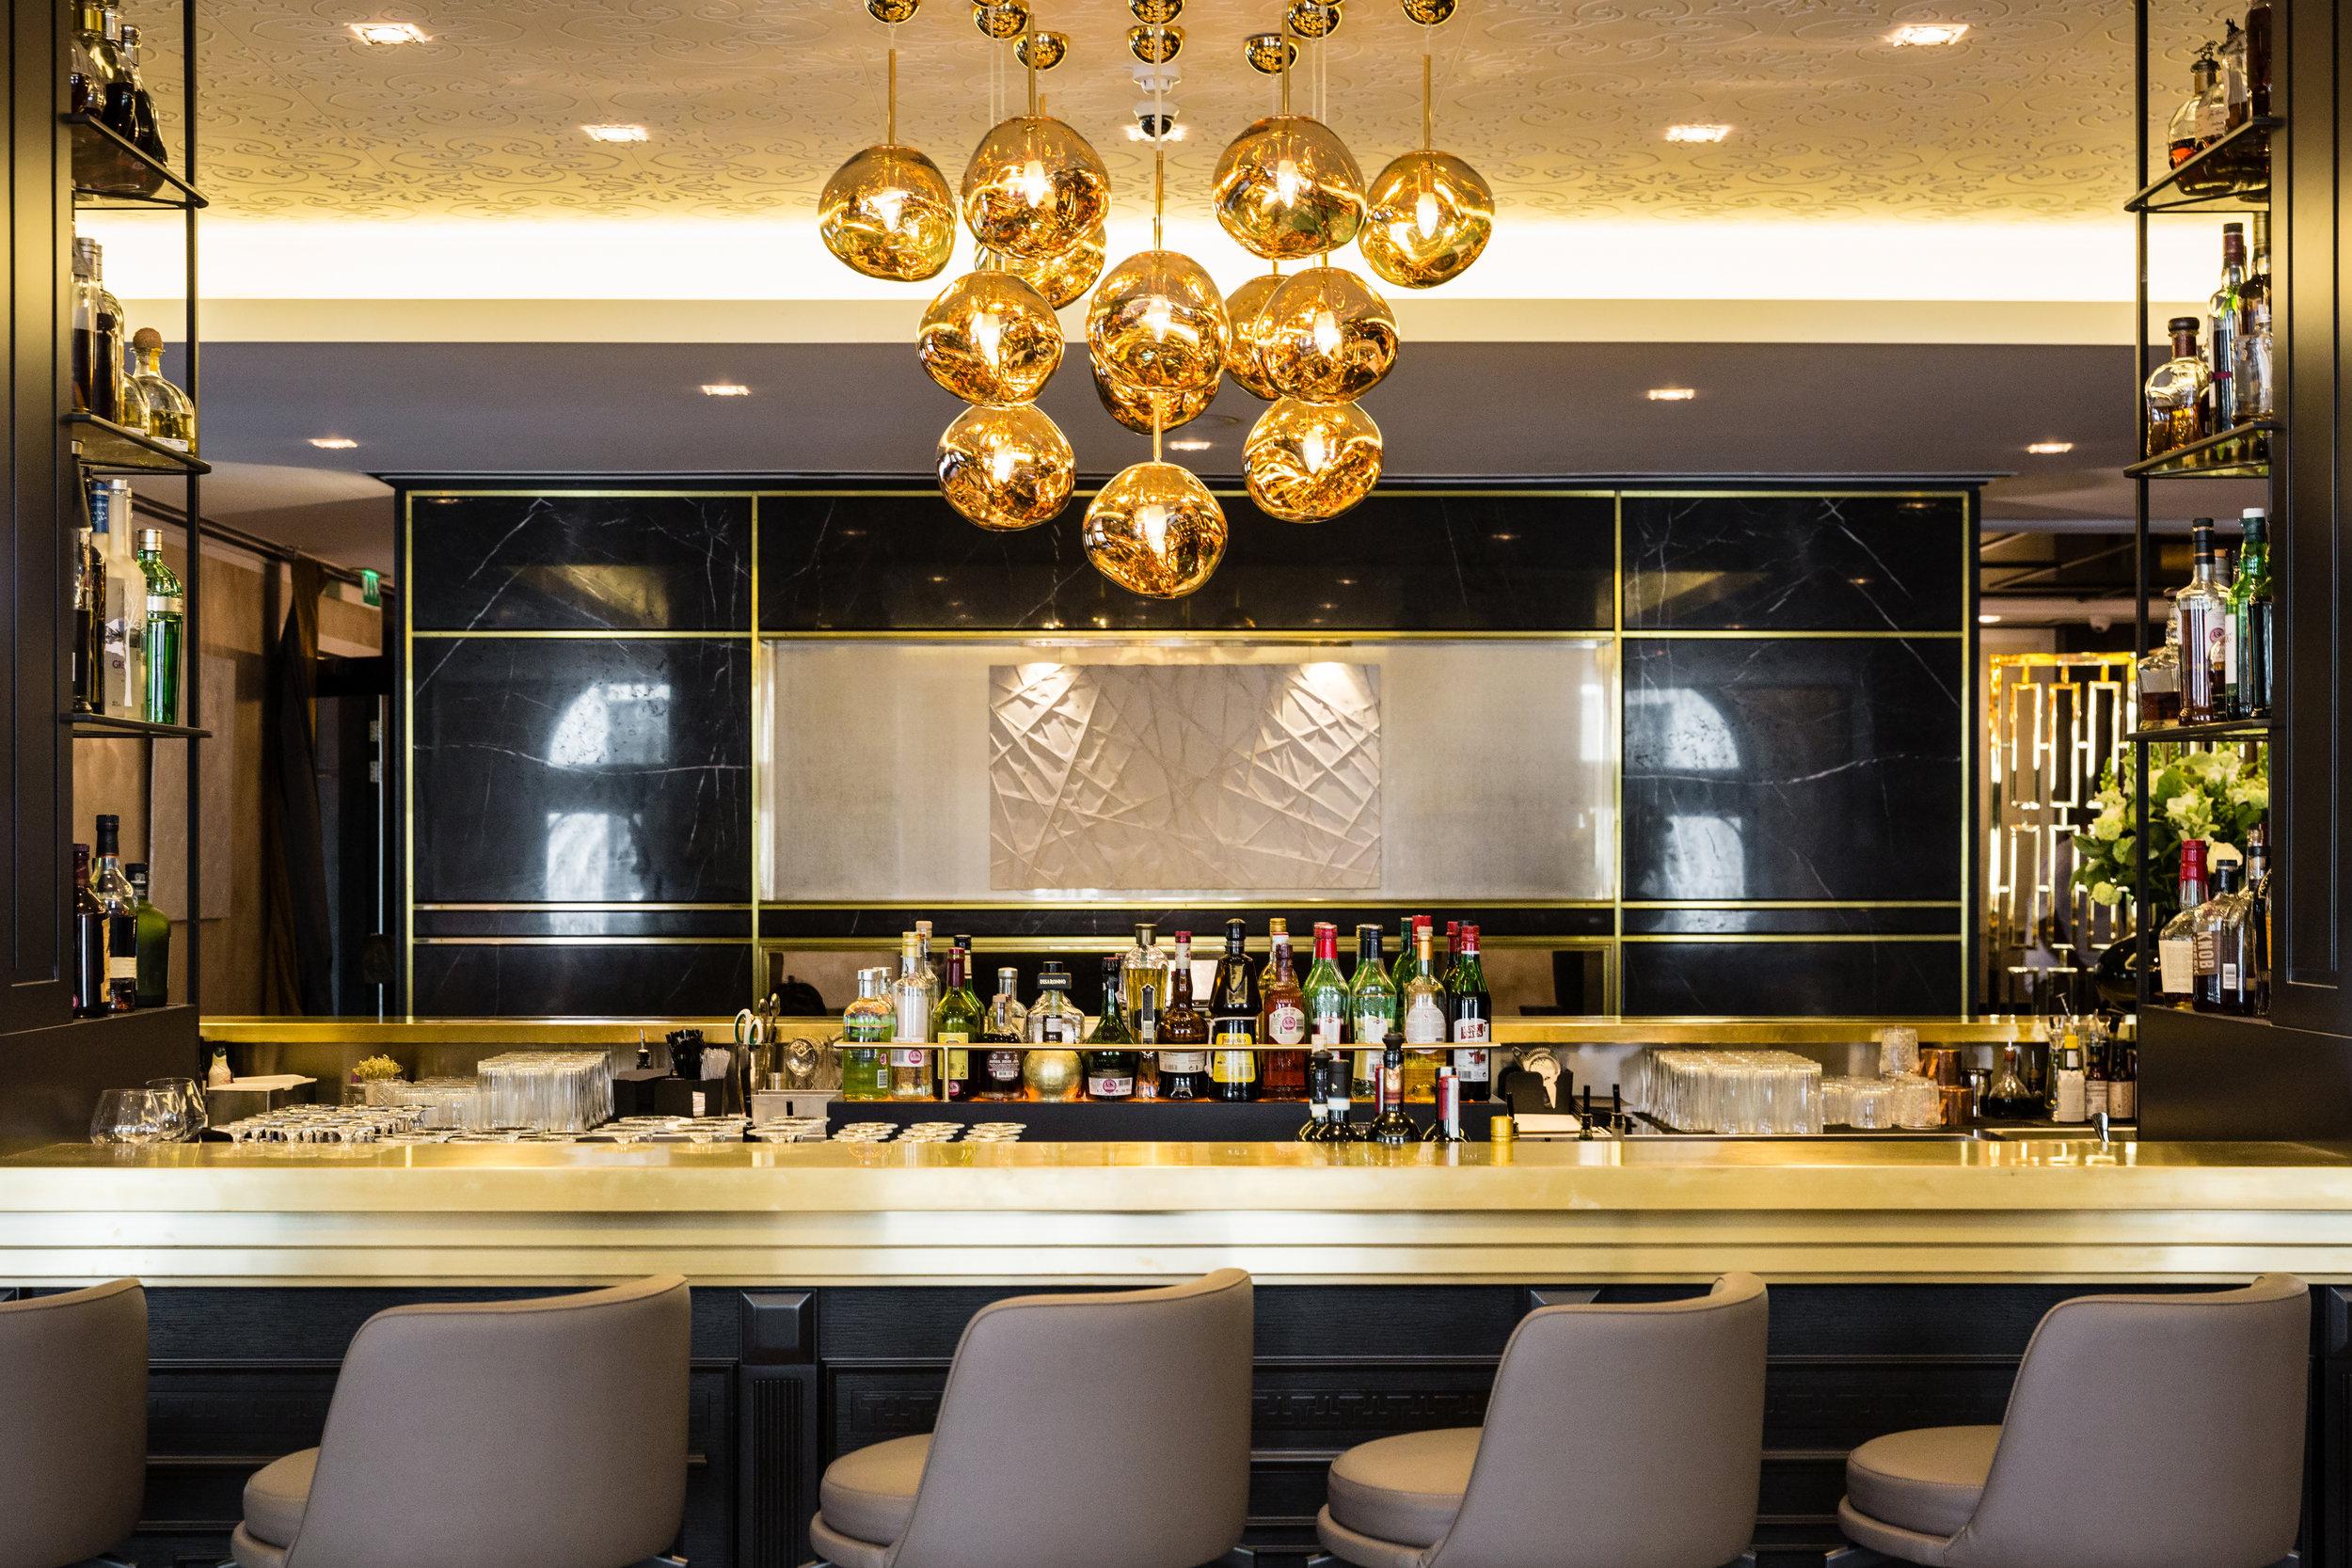 Brunello_Bar_and_Restaurant_bar2_©DiegoDePol.JPG